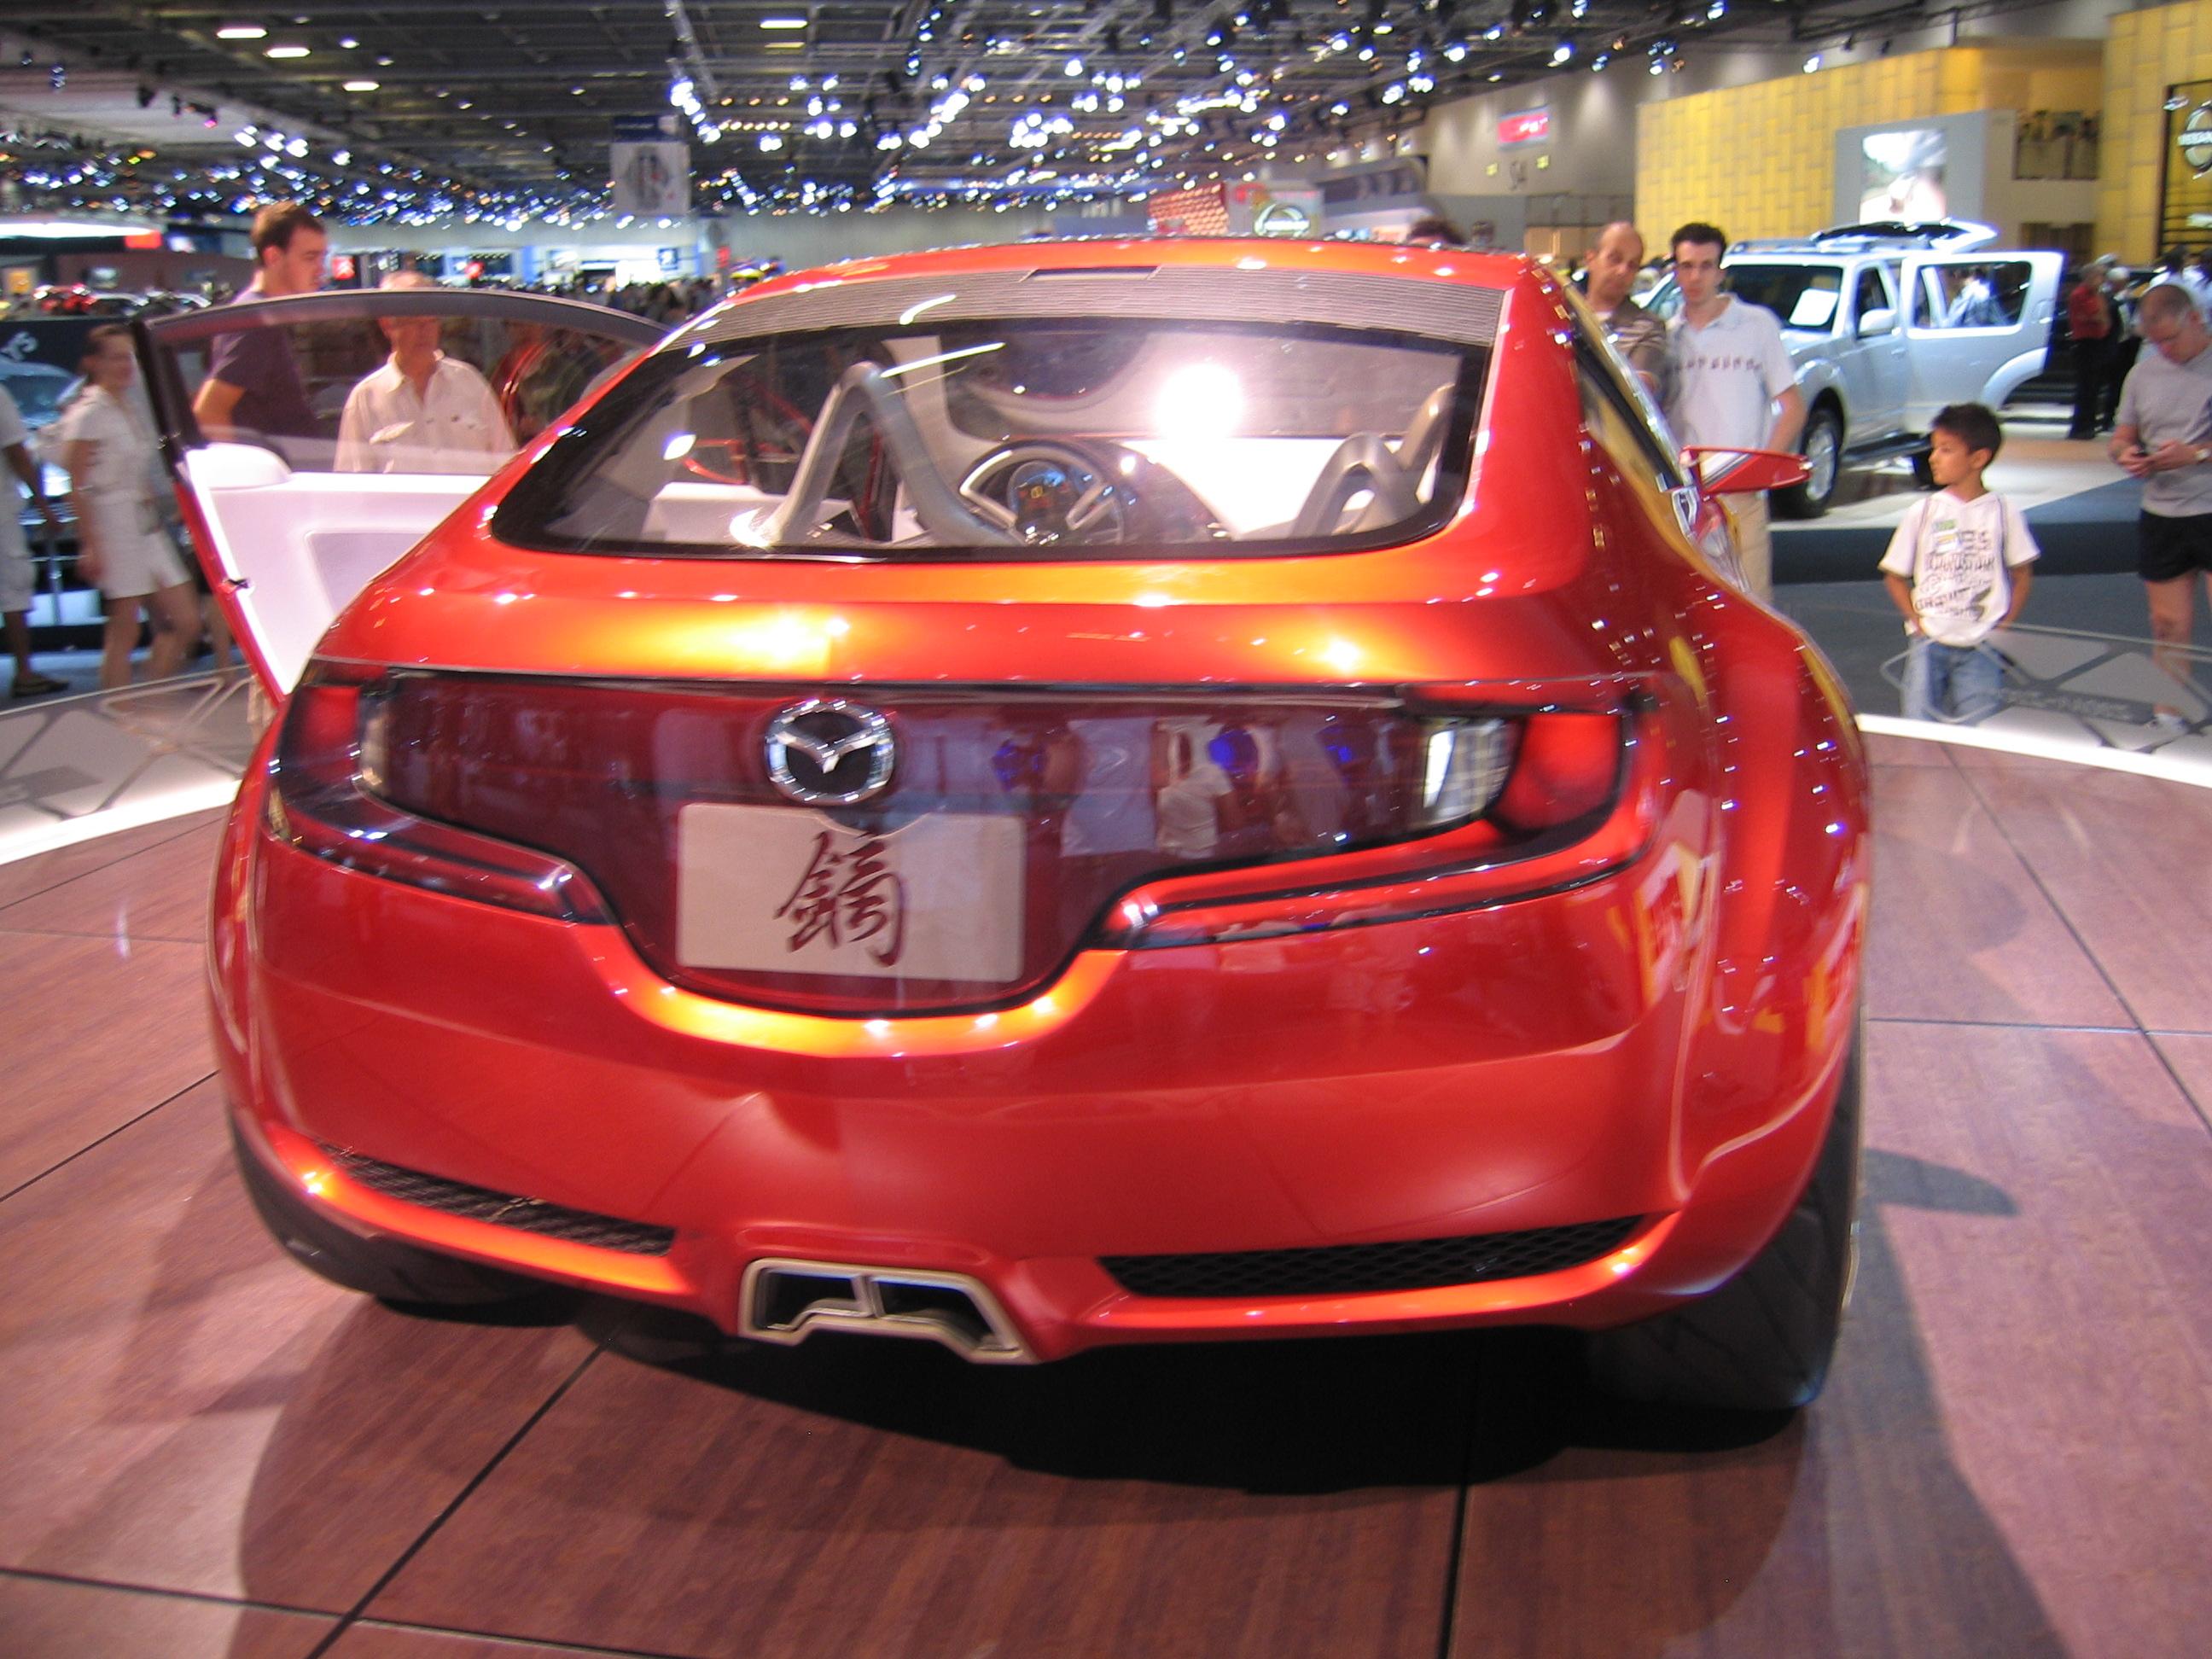 filemazda concept car flickr robad0b 1jpg